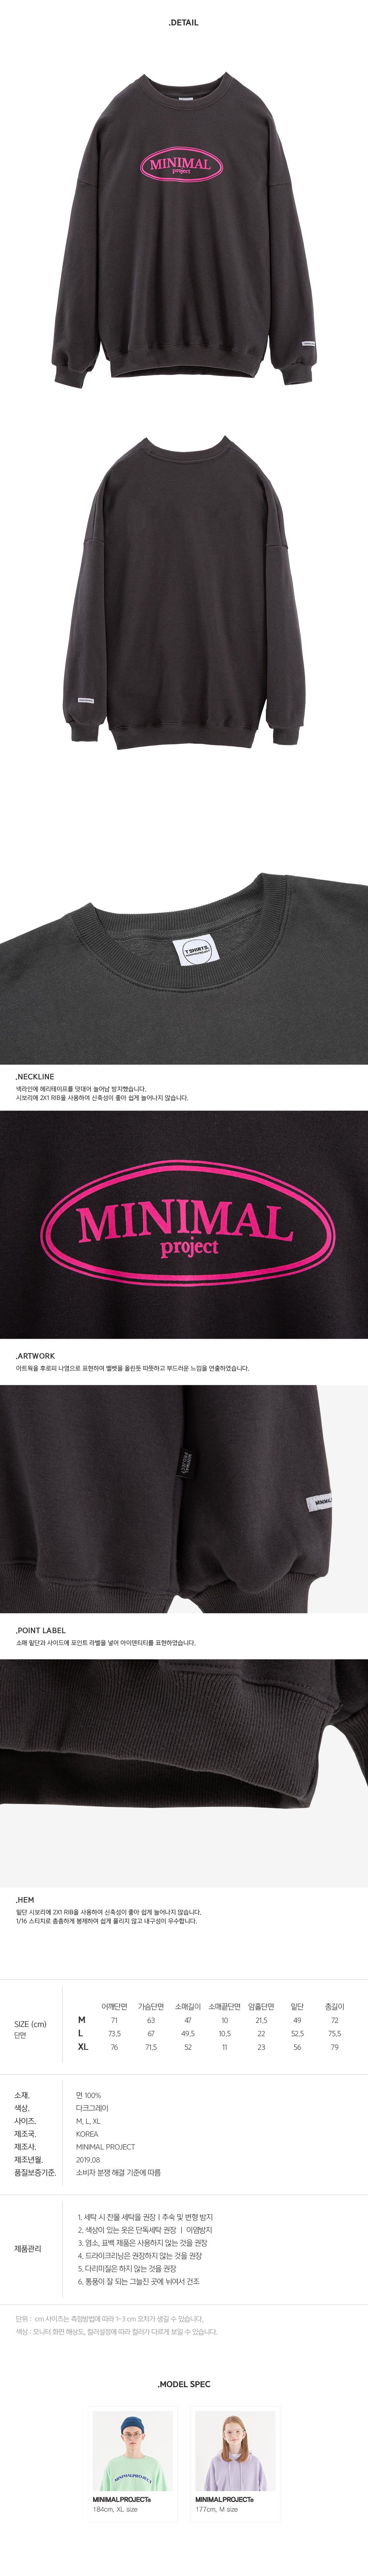 [minimal project] 미니멀프로젝트 클래식 오벌 오버핏 맨투맨 MMT106 [DARKGREY]